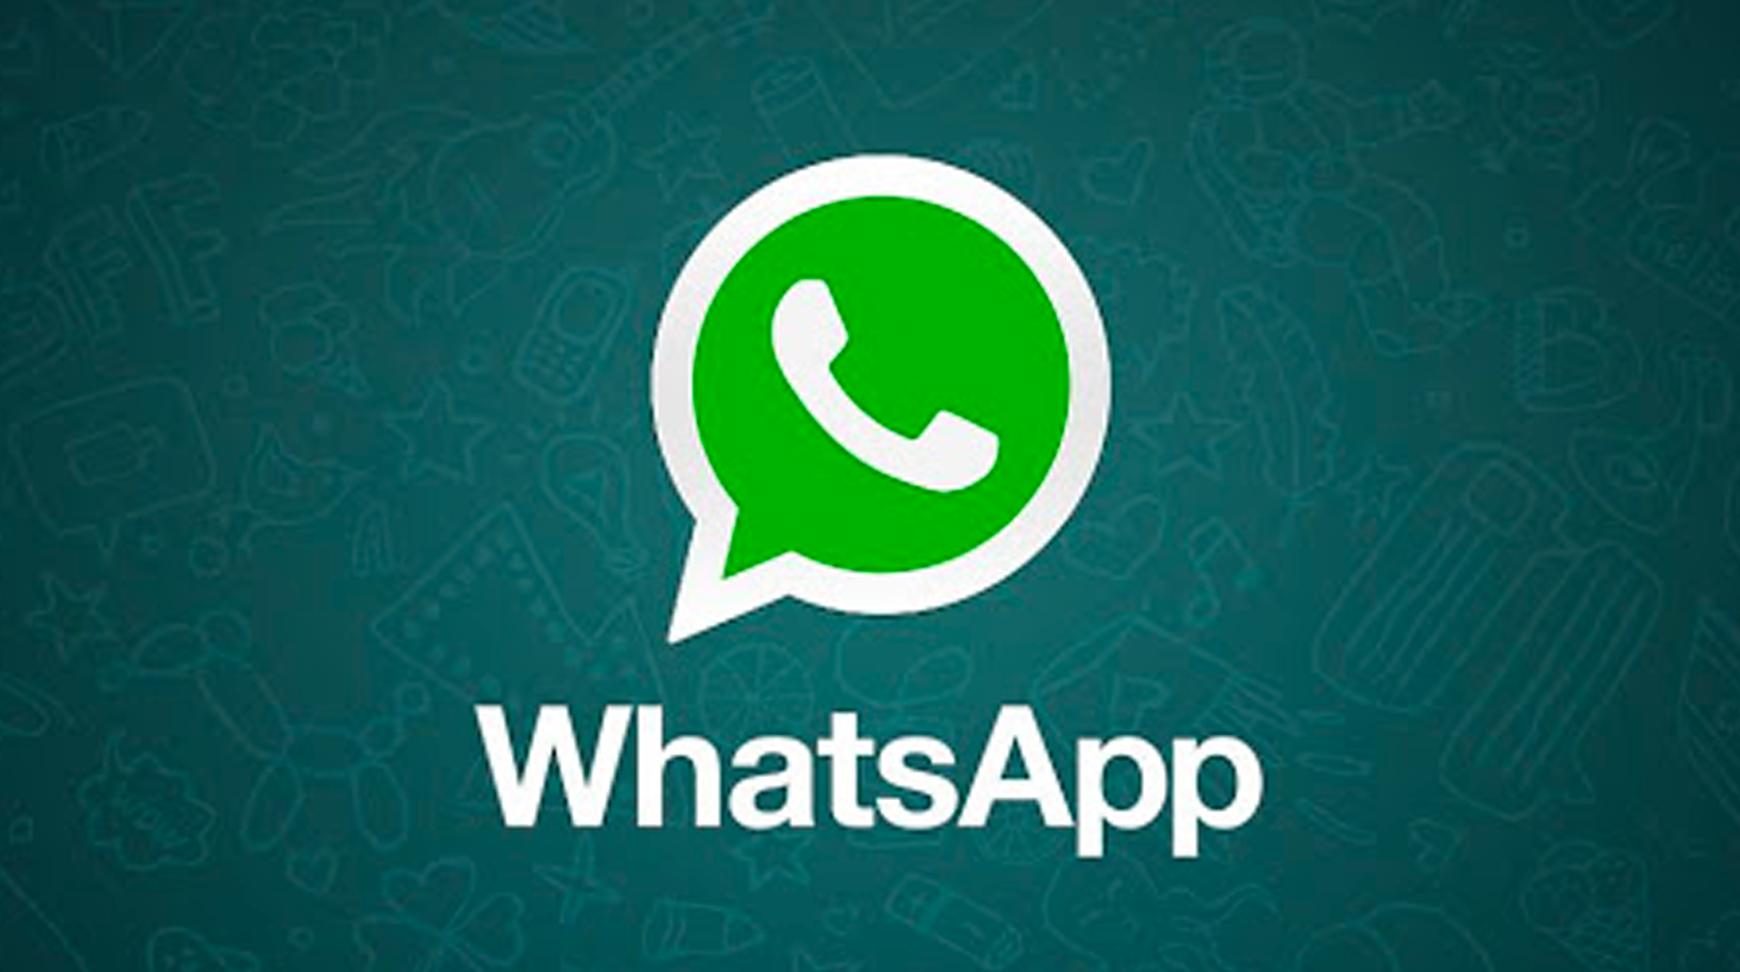 3 cops share racist material on WhatsApp of Kayode Ewumi meme